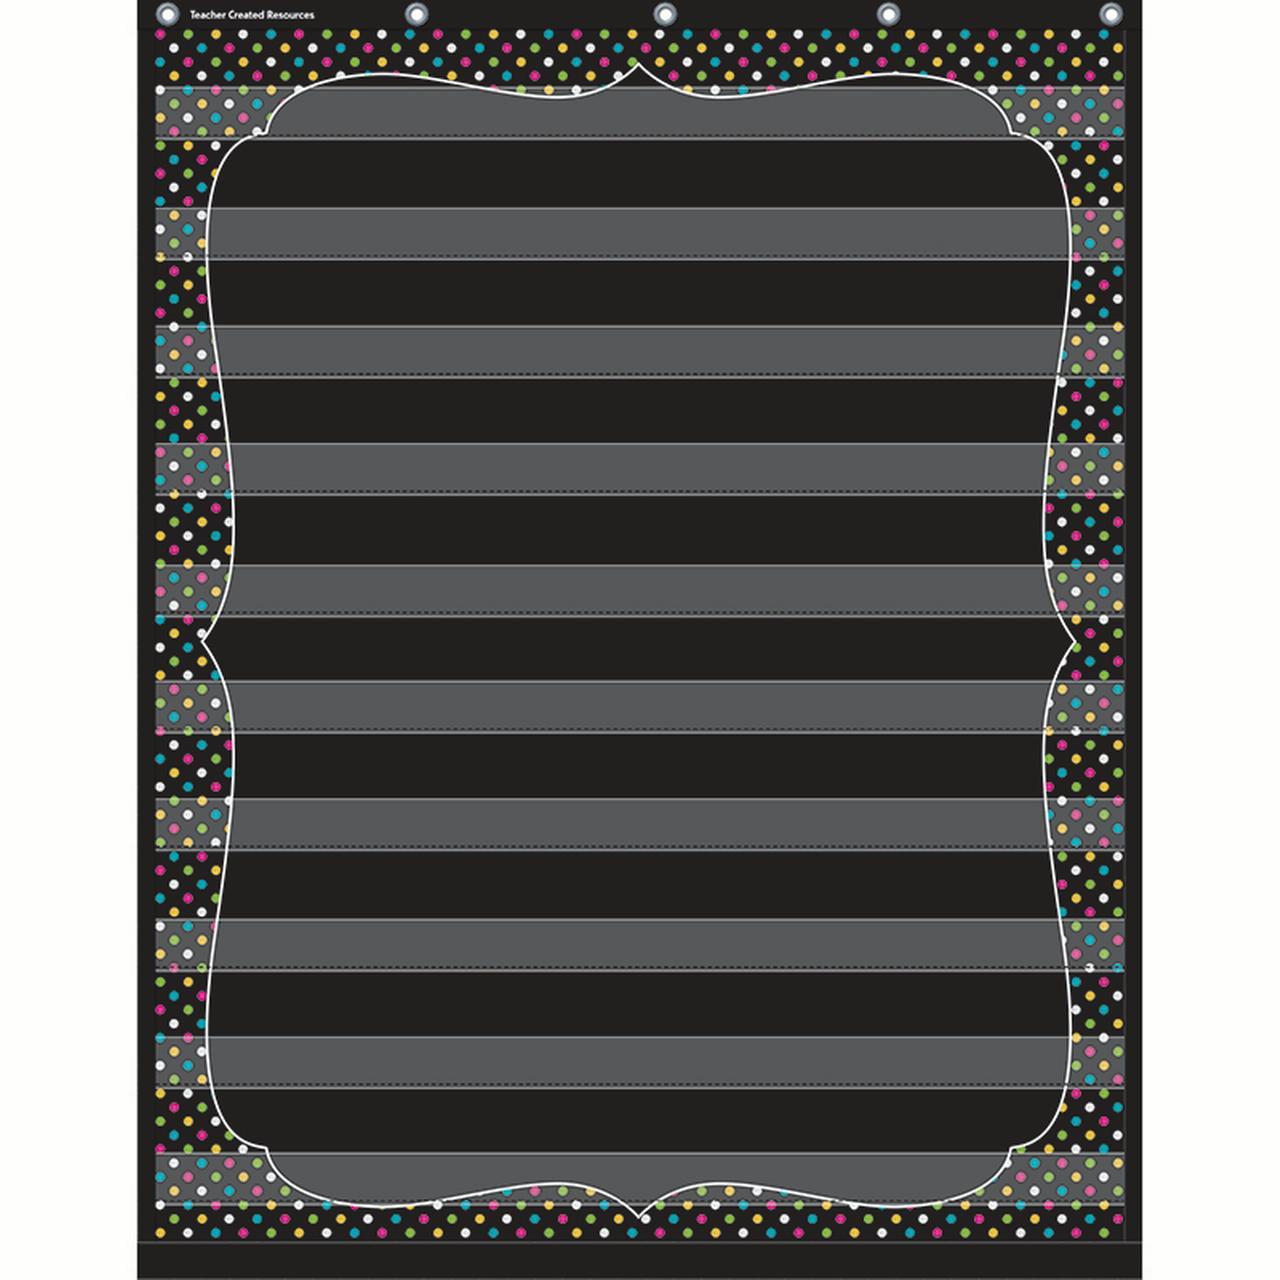 Chalkboard Brights 10 Pocket Chart - image 1 de 1